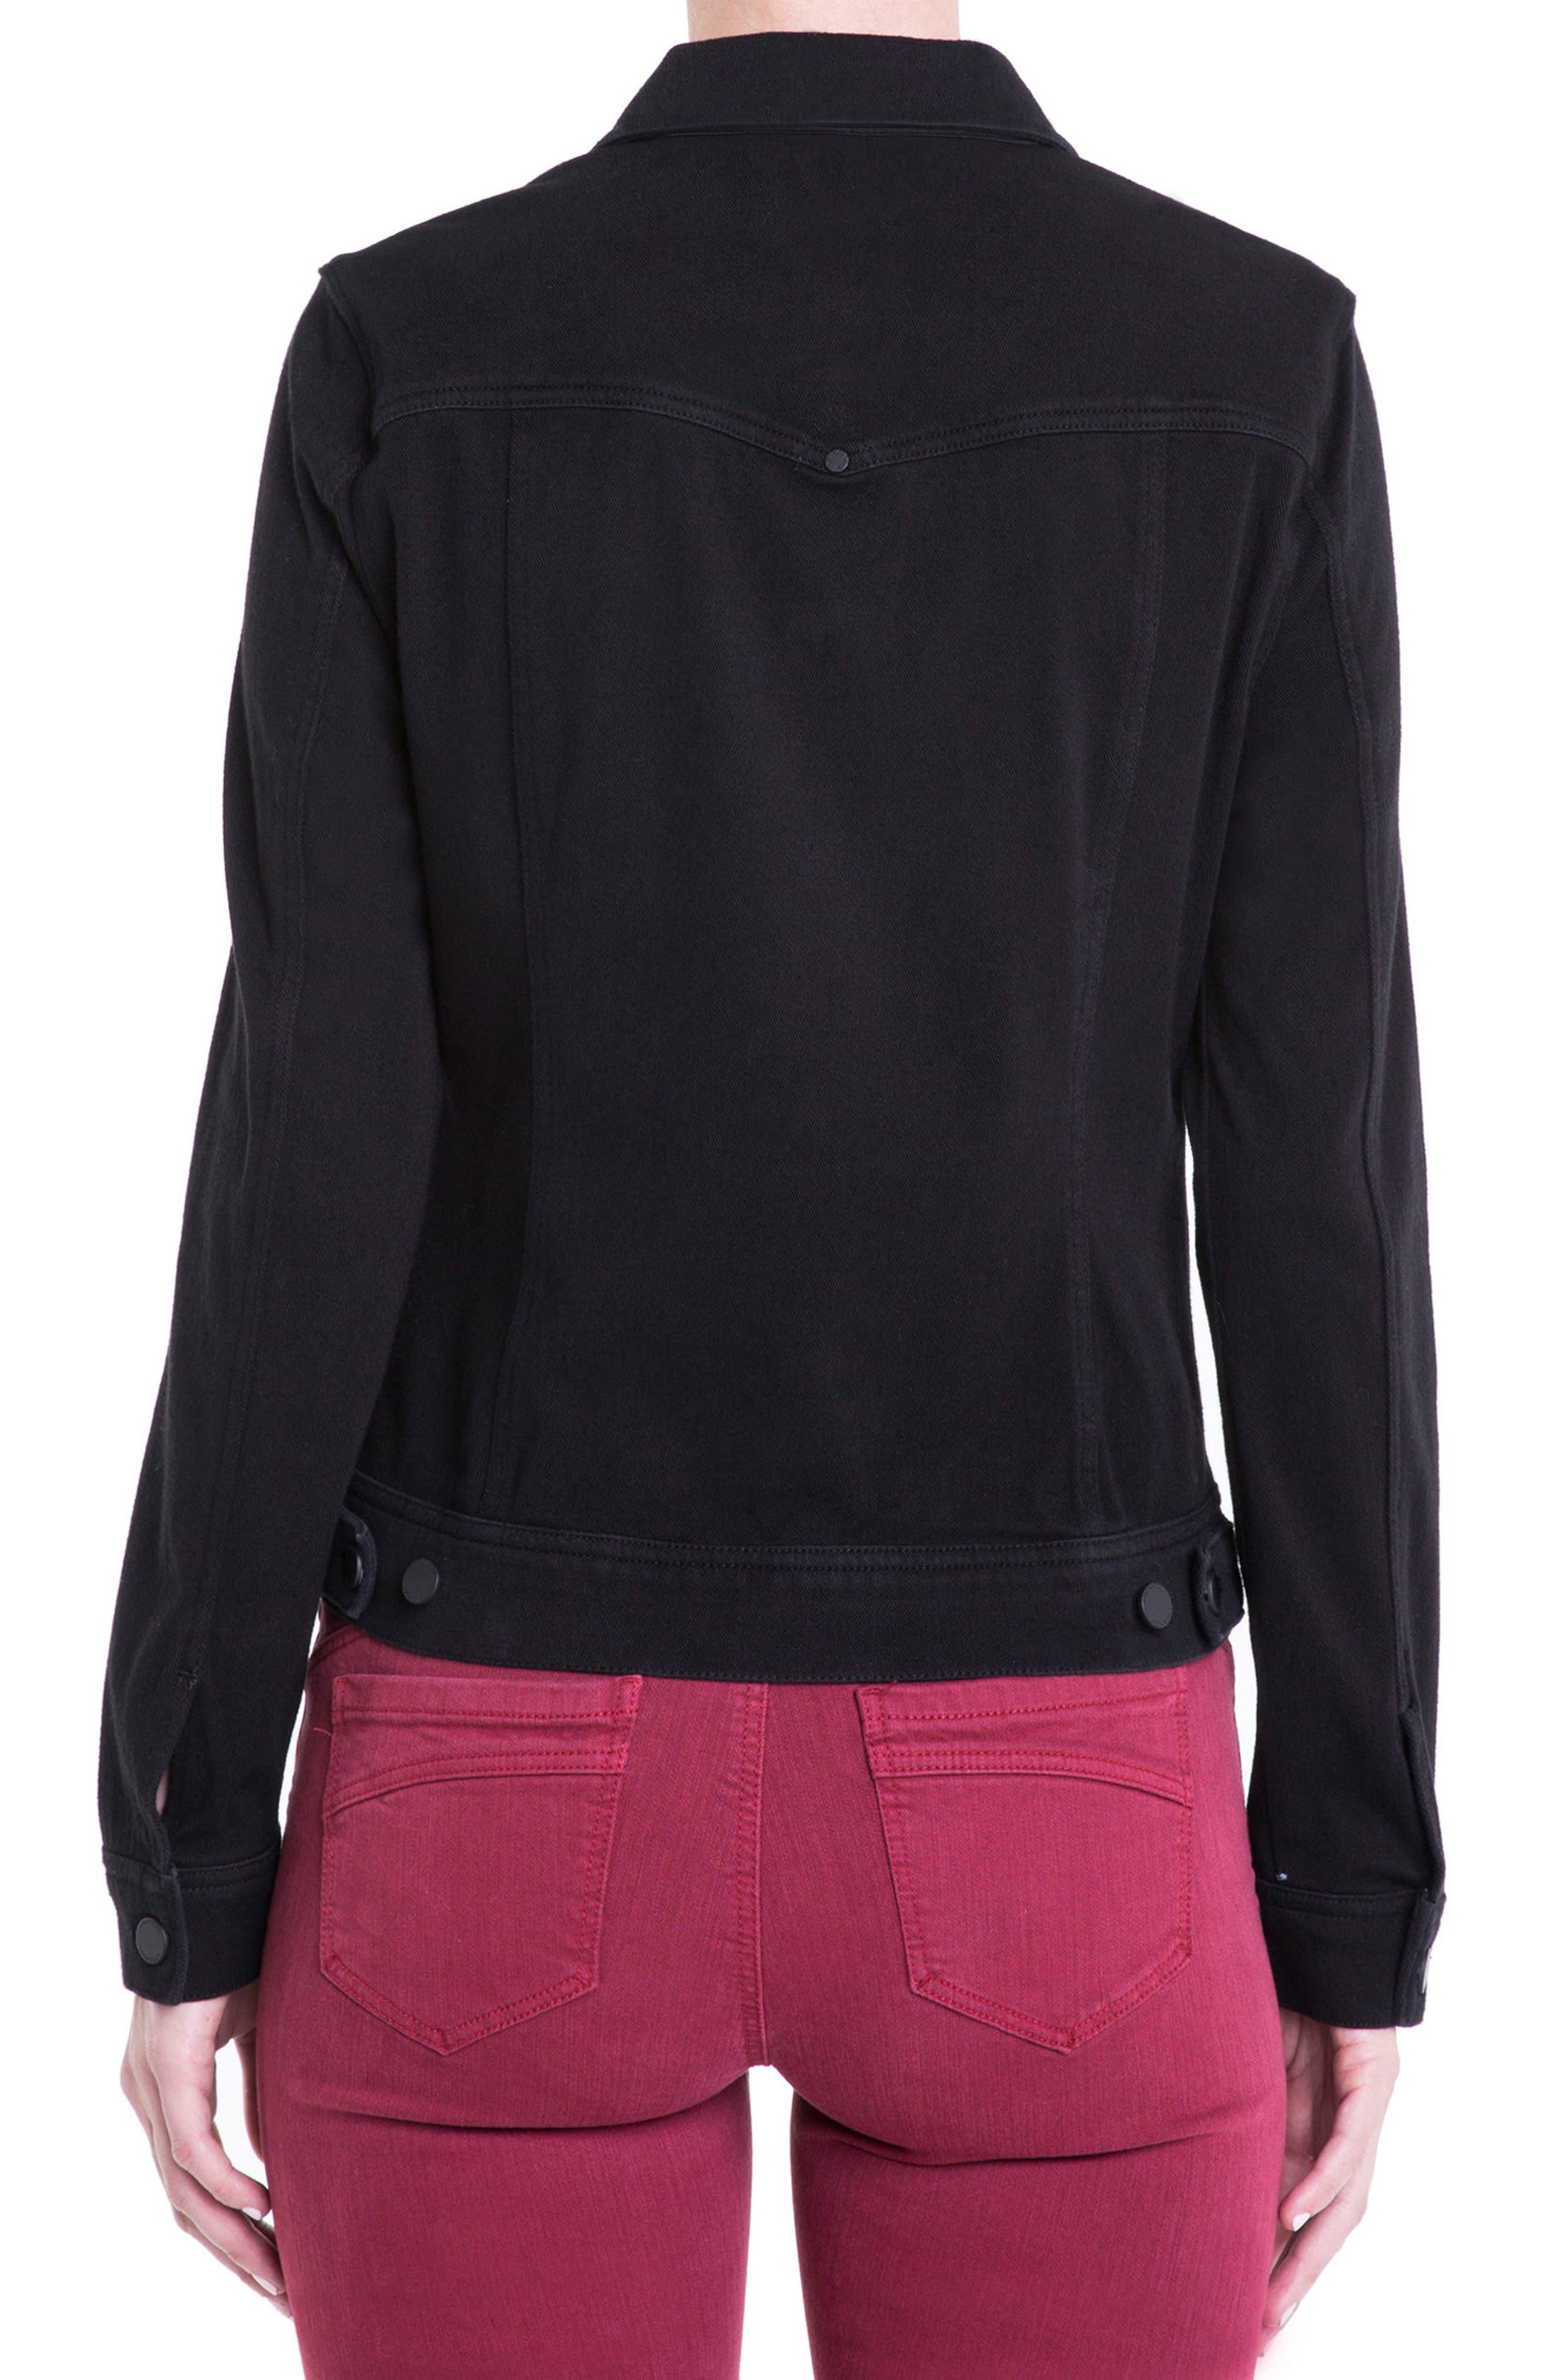 Alternate Image 3  - Liverpool Jeans Co. Knit Denim Jacket (Petite)